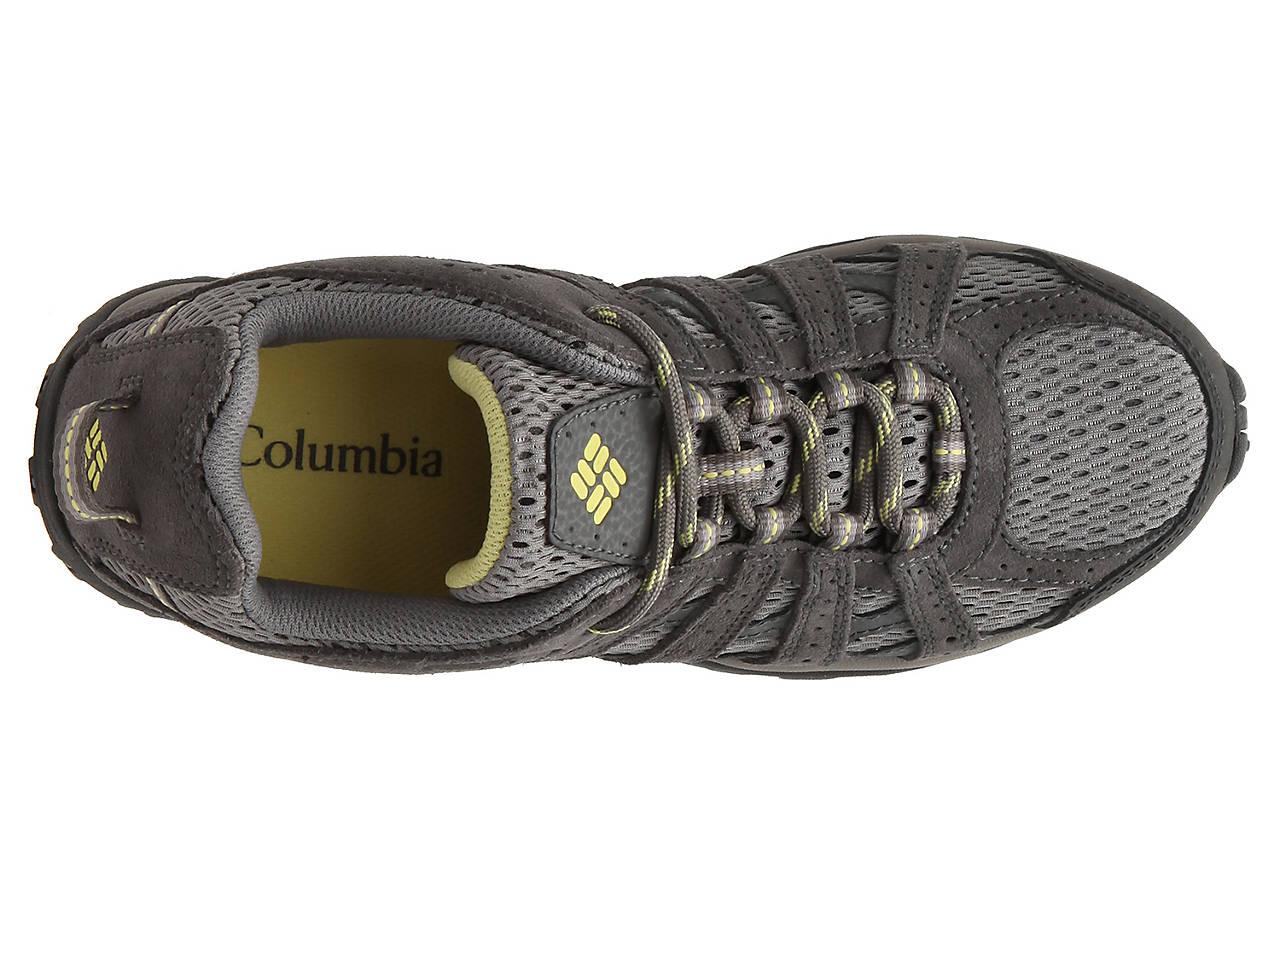 4e5c6e6fc92e Columbia Redmond Breeze Hiking Shoe Women s Shoes